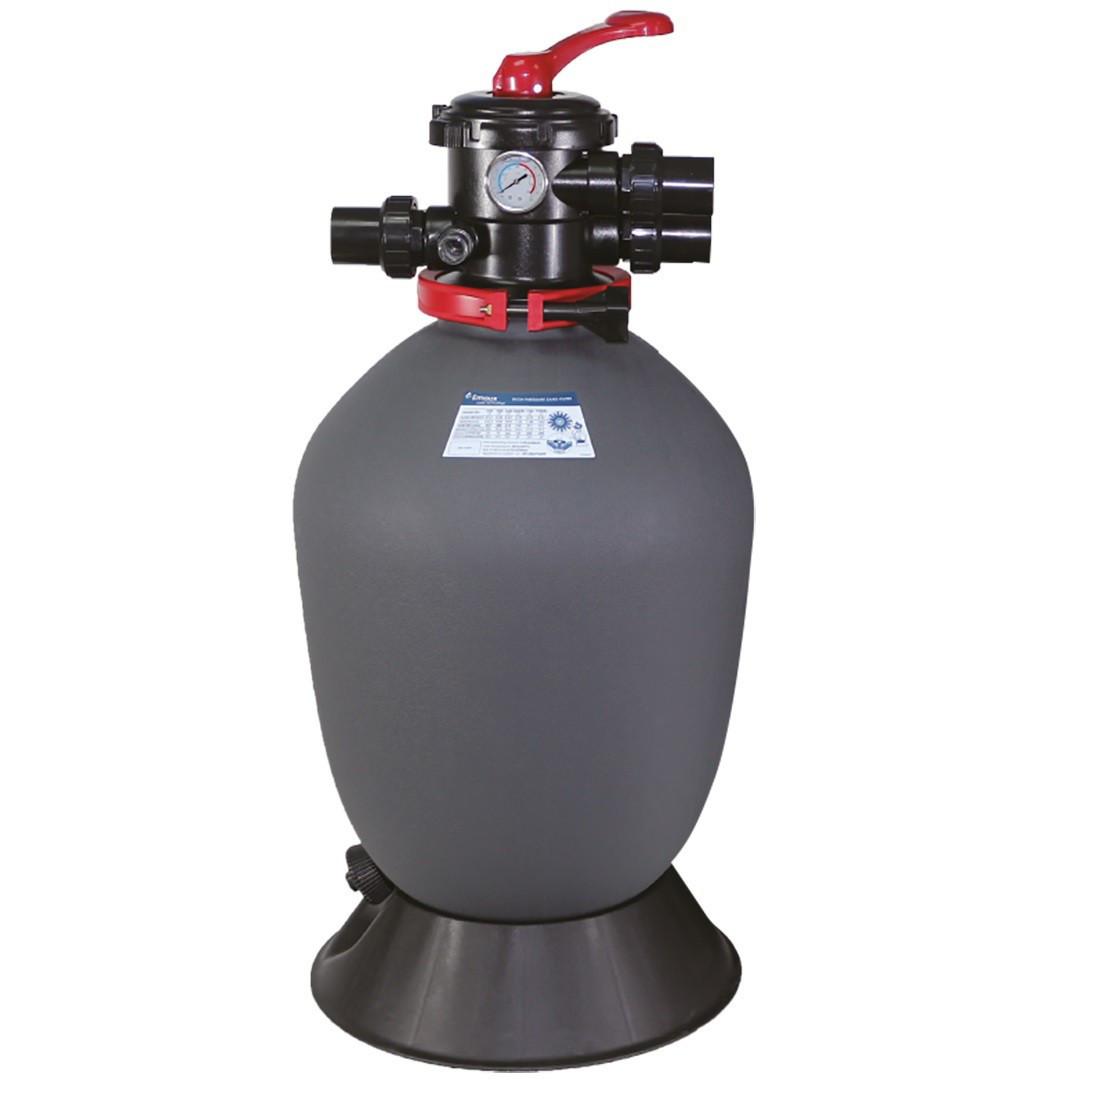 Фильтр Emaux T700 Volumetric (19.5 м³/час, D711)